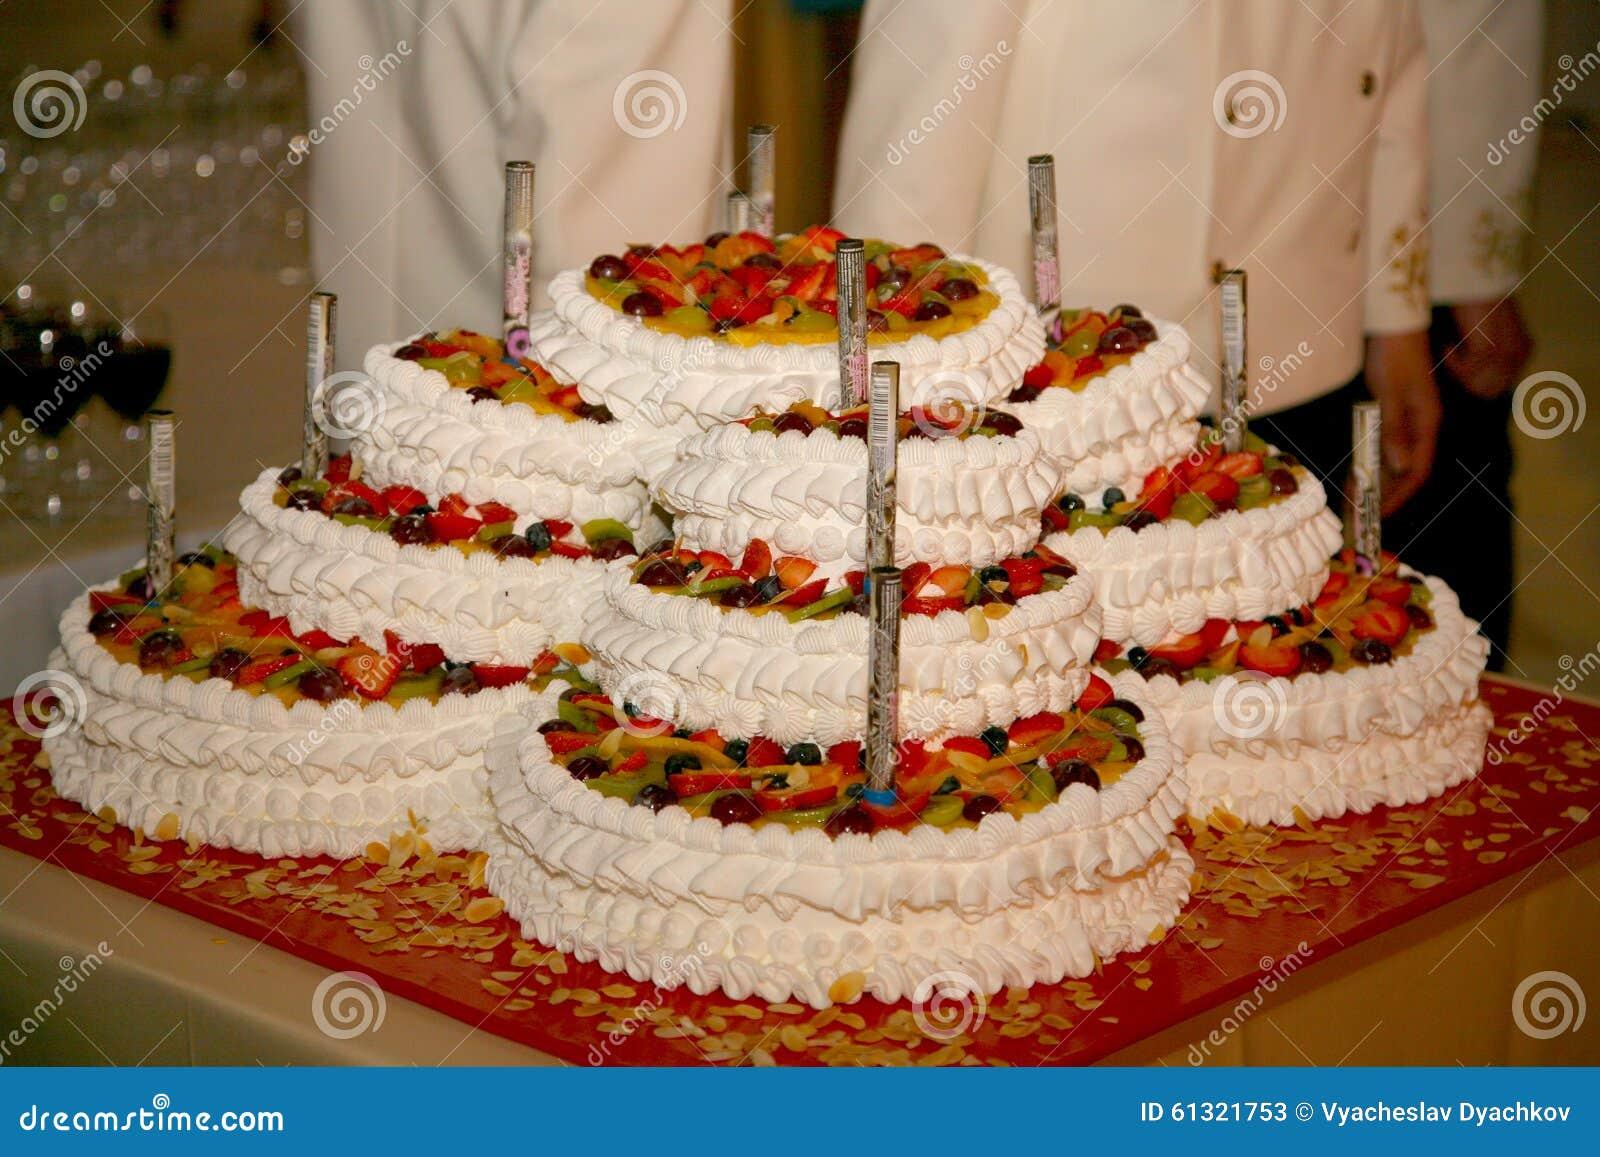 Beautiful Large Multi Tiered Wedding Cake Of Complex Shape